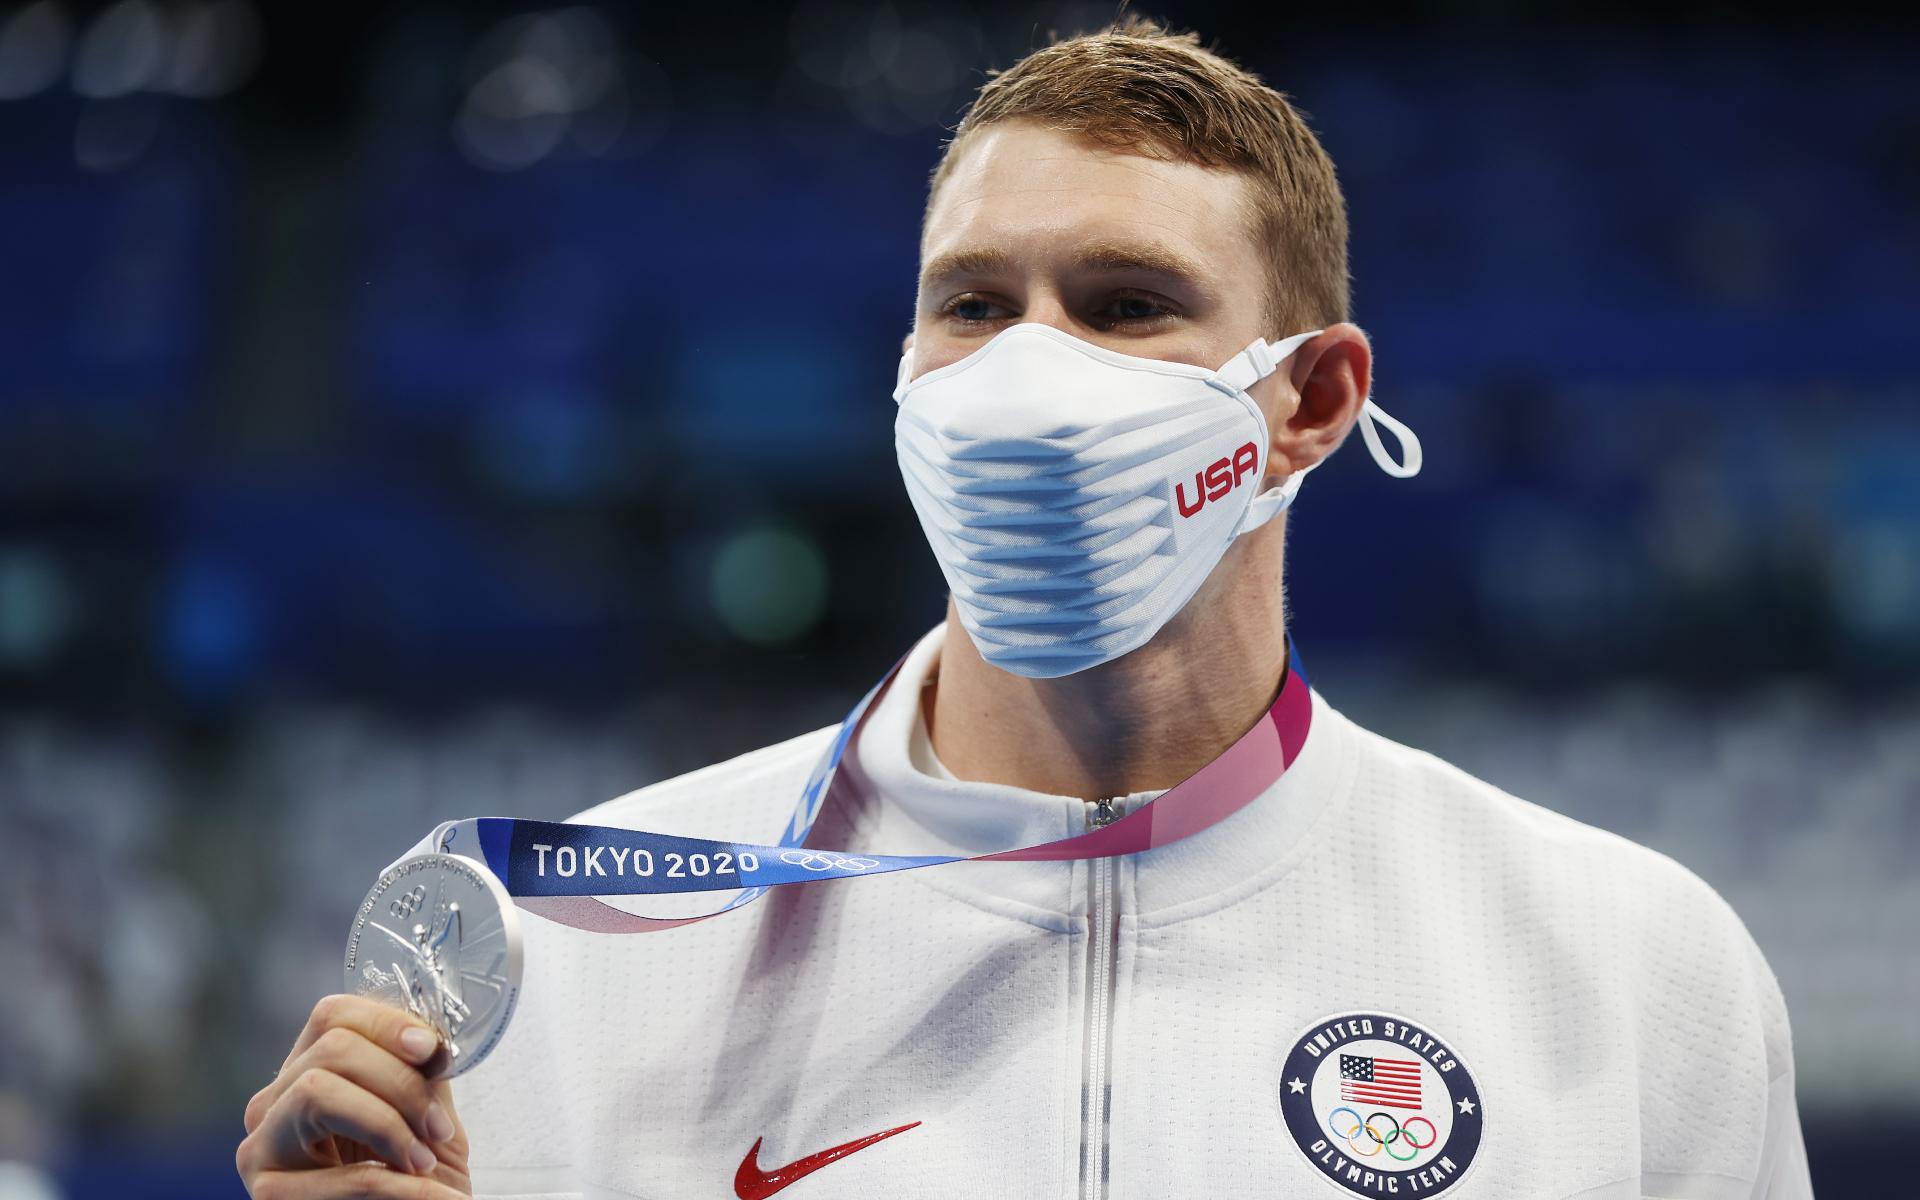 Американский пловец Райан Мерфи